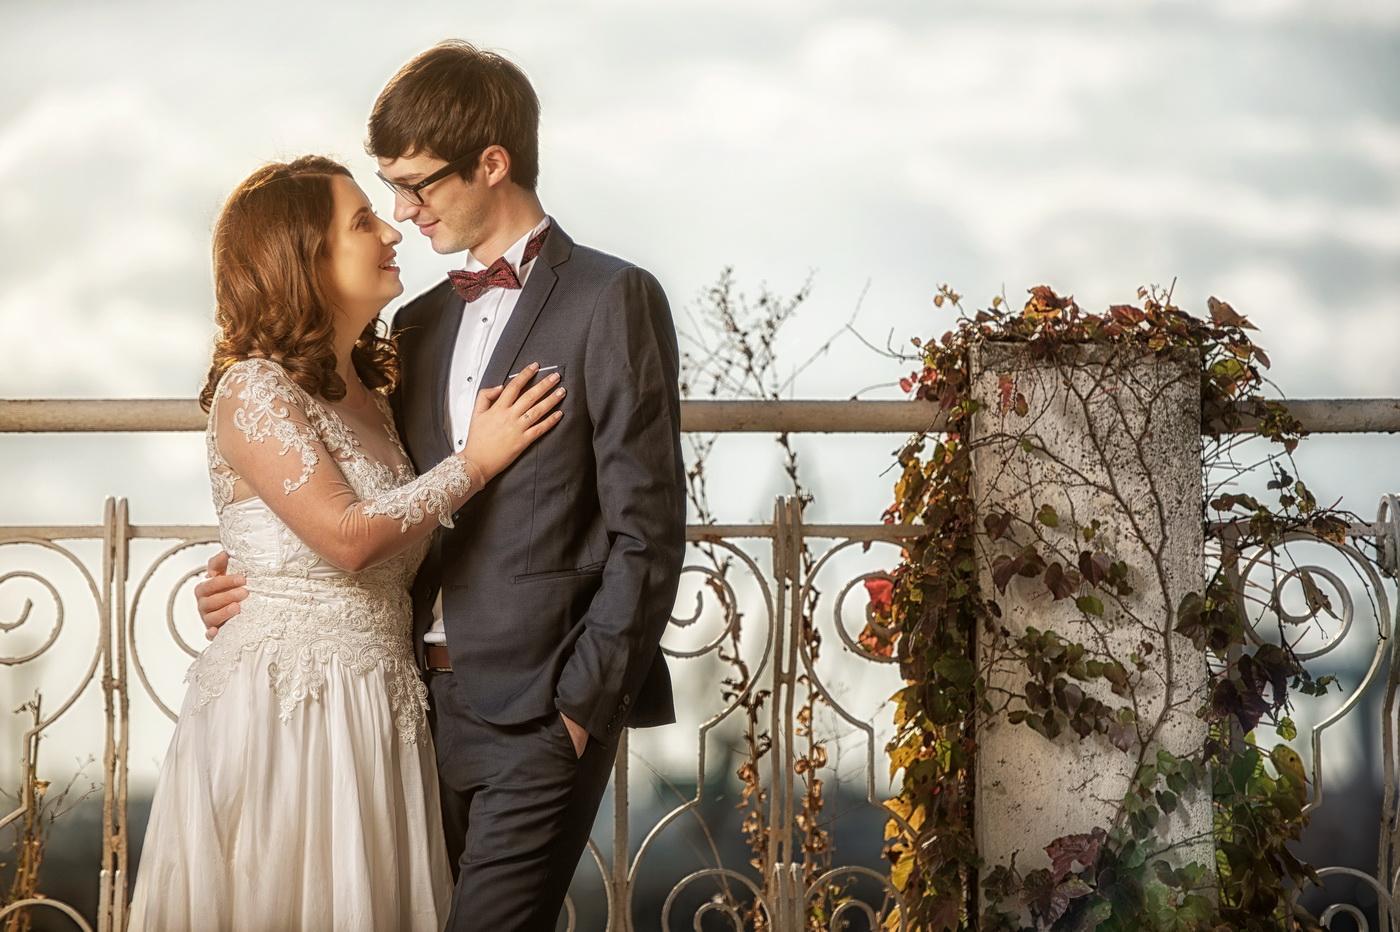 Destination Wedding Photographer_Marian Sterea_127.jpg